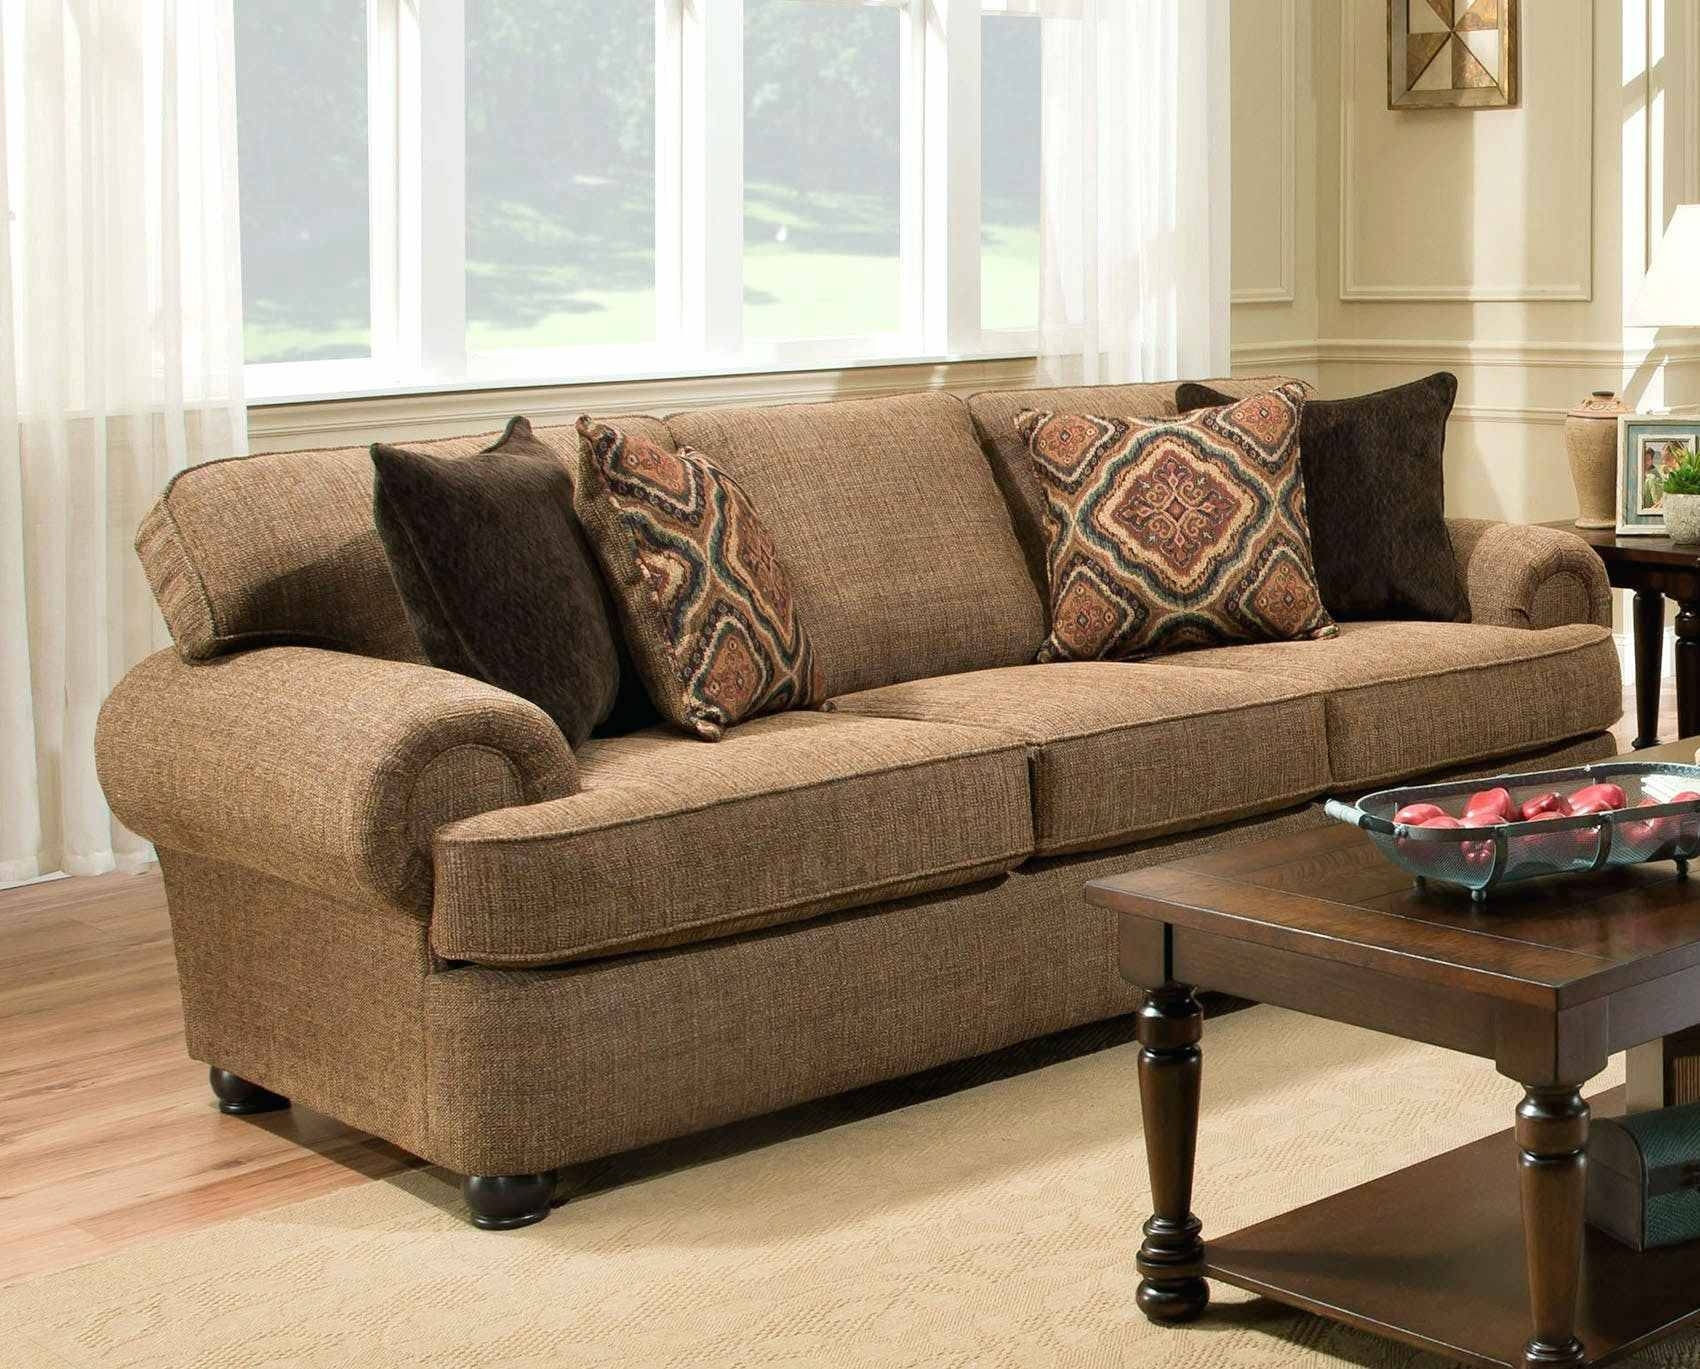 Simmons Sofa Bed Mattress Replacement Reclining Big Lots #13530 regarding Big Lots Simmons Furniture (Image 14 of 15)